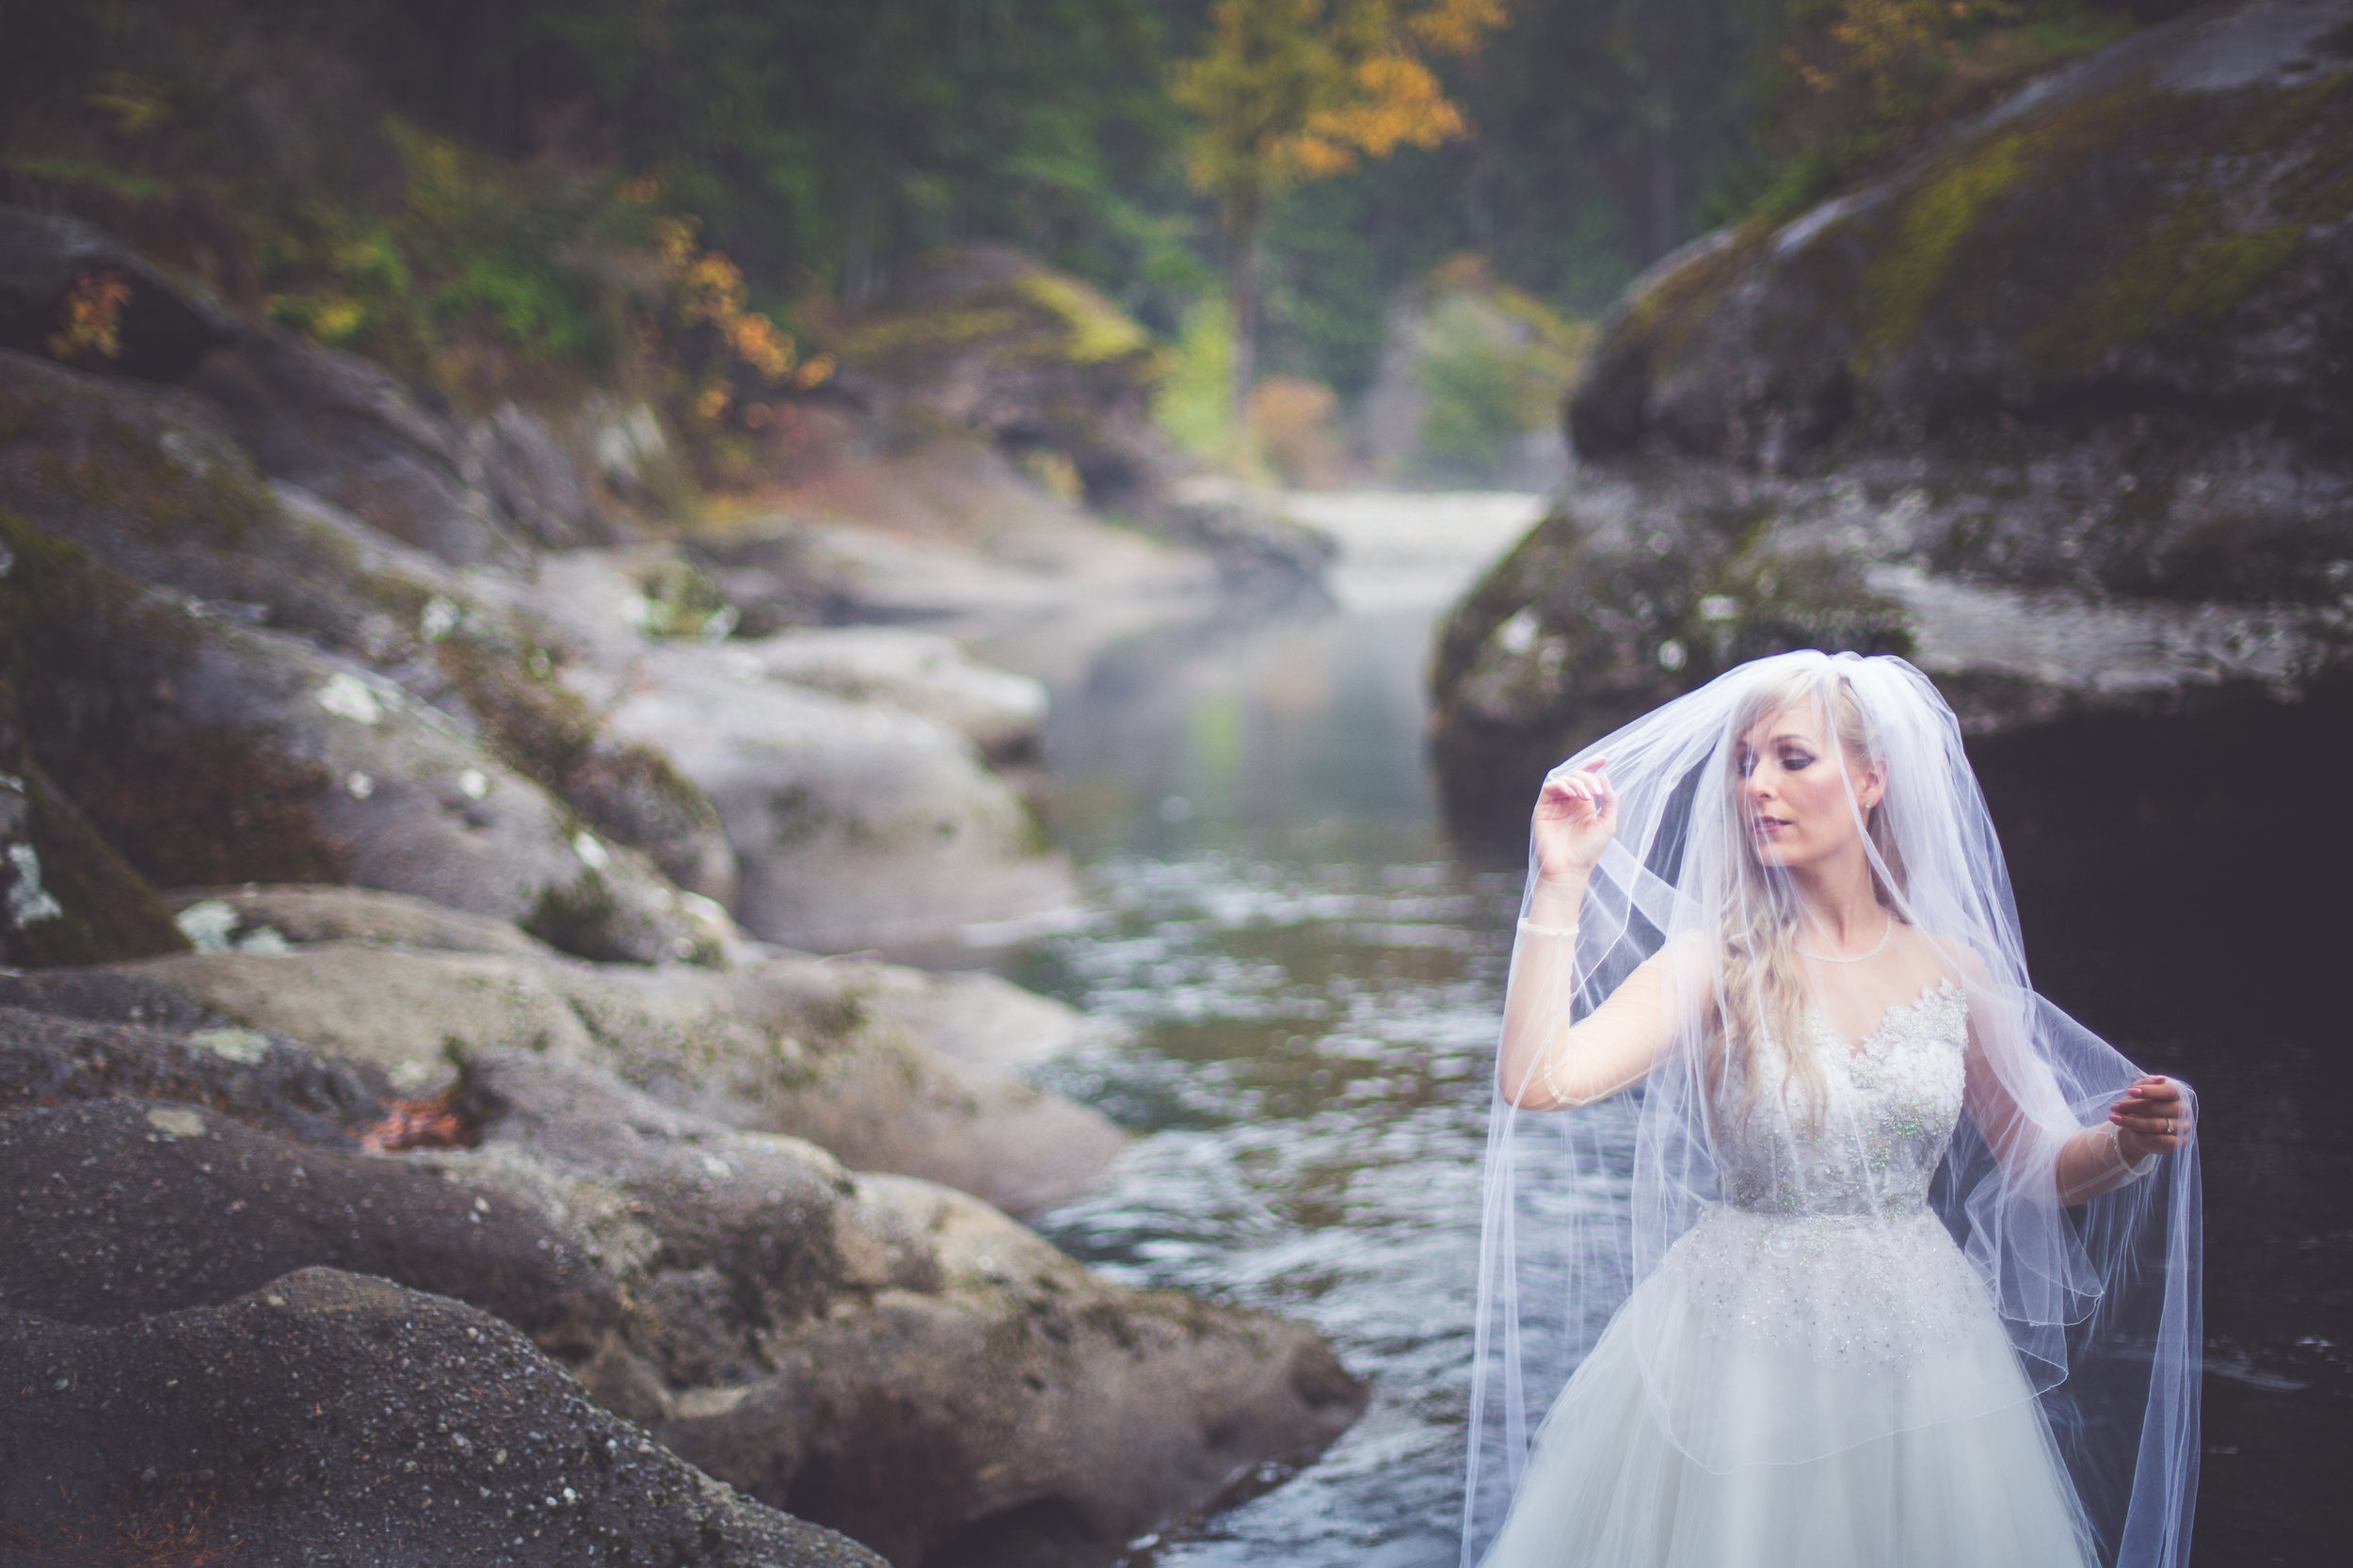 whimsical-romantic-wedding-top-bridge-16.jpg